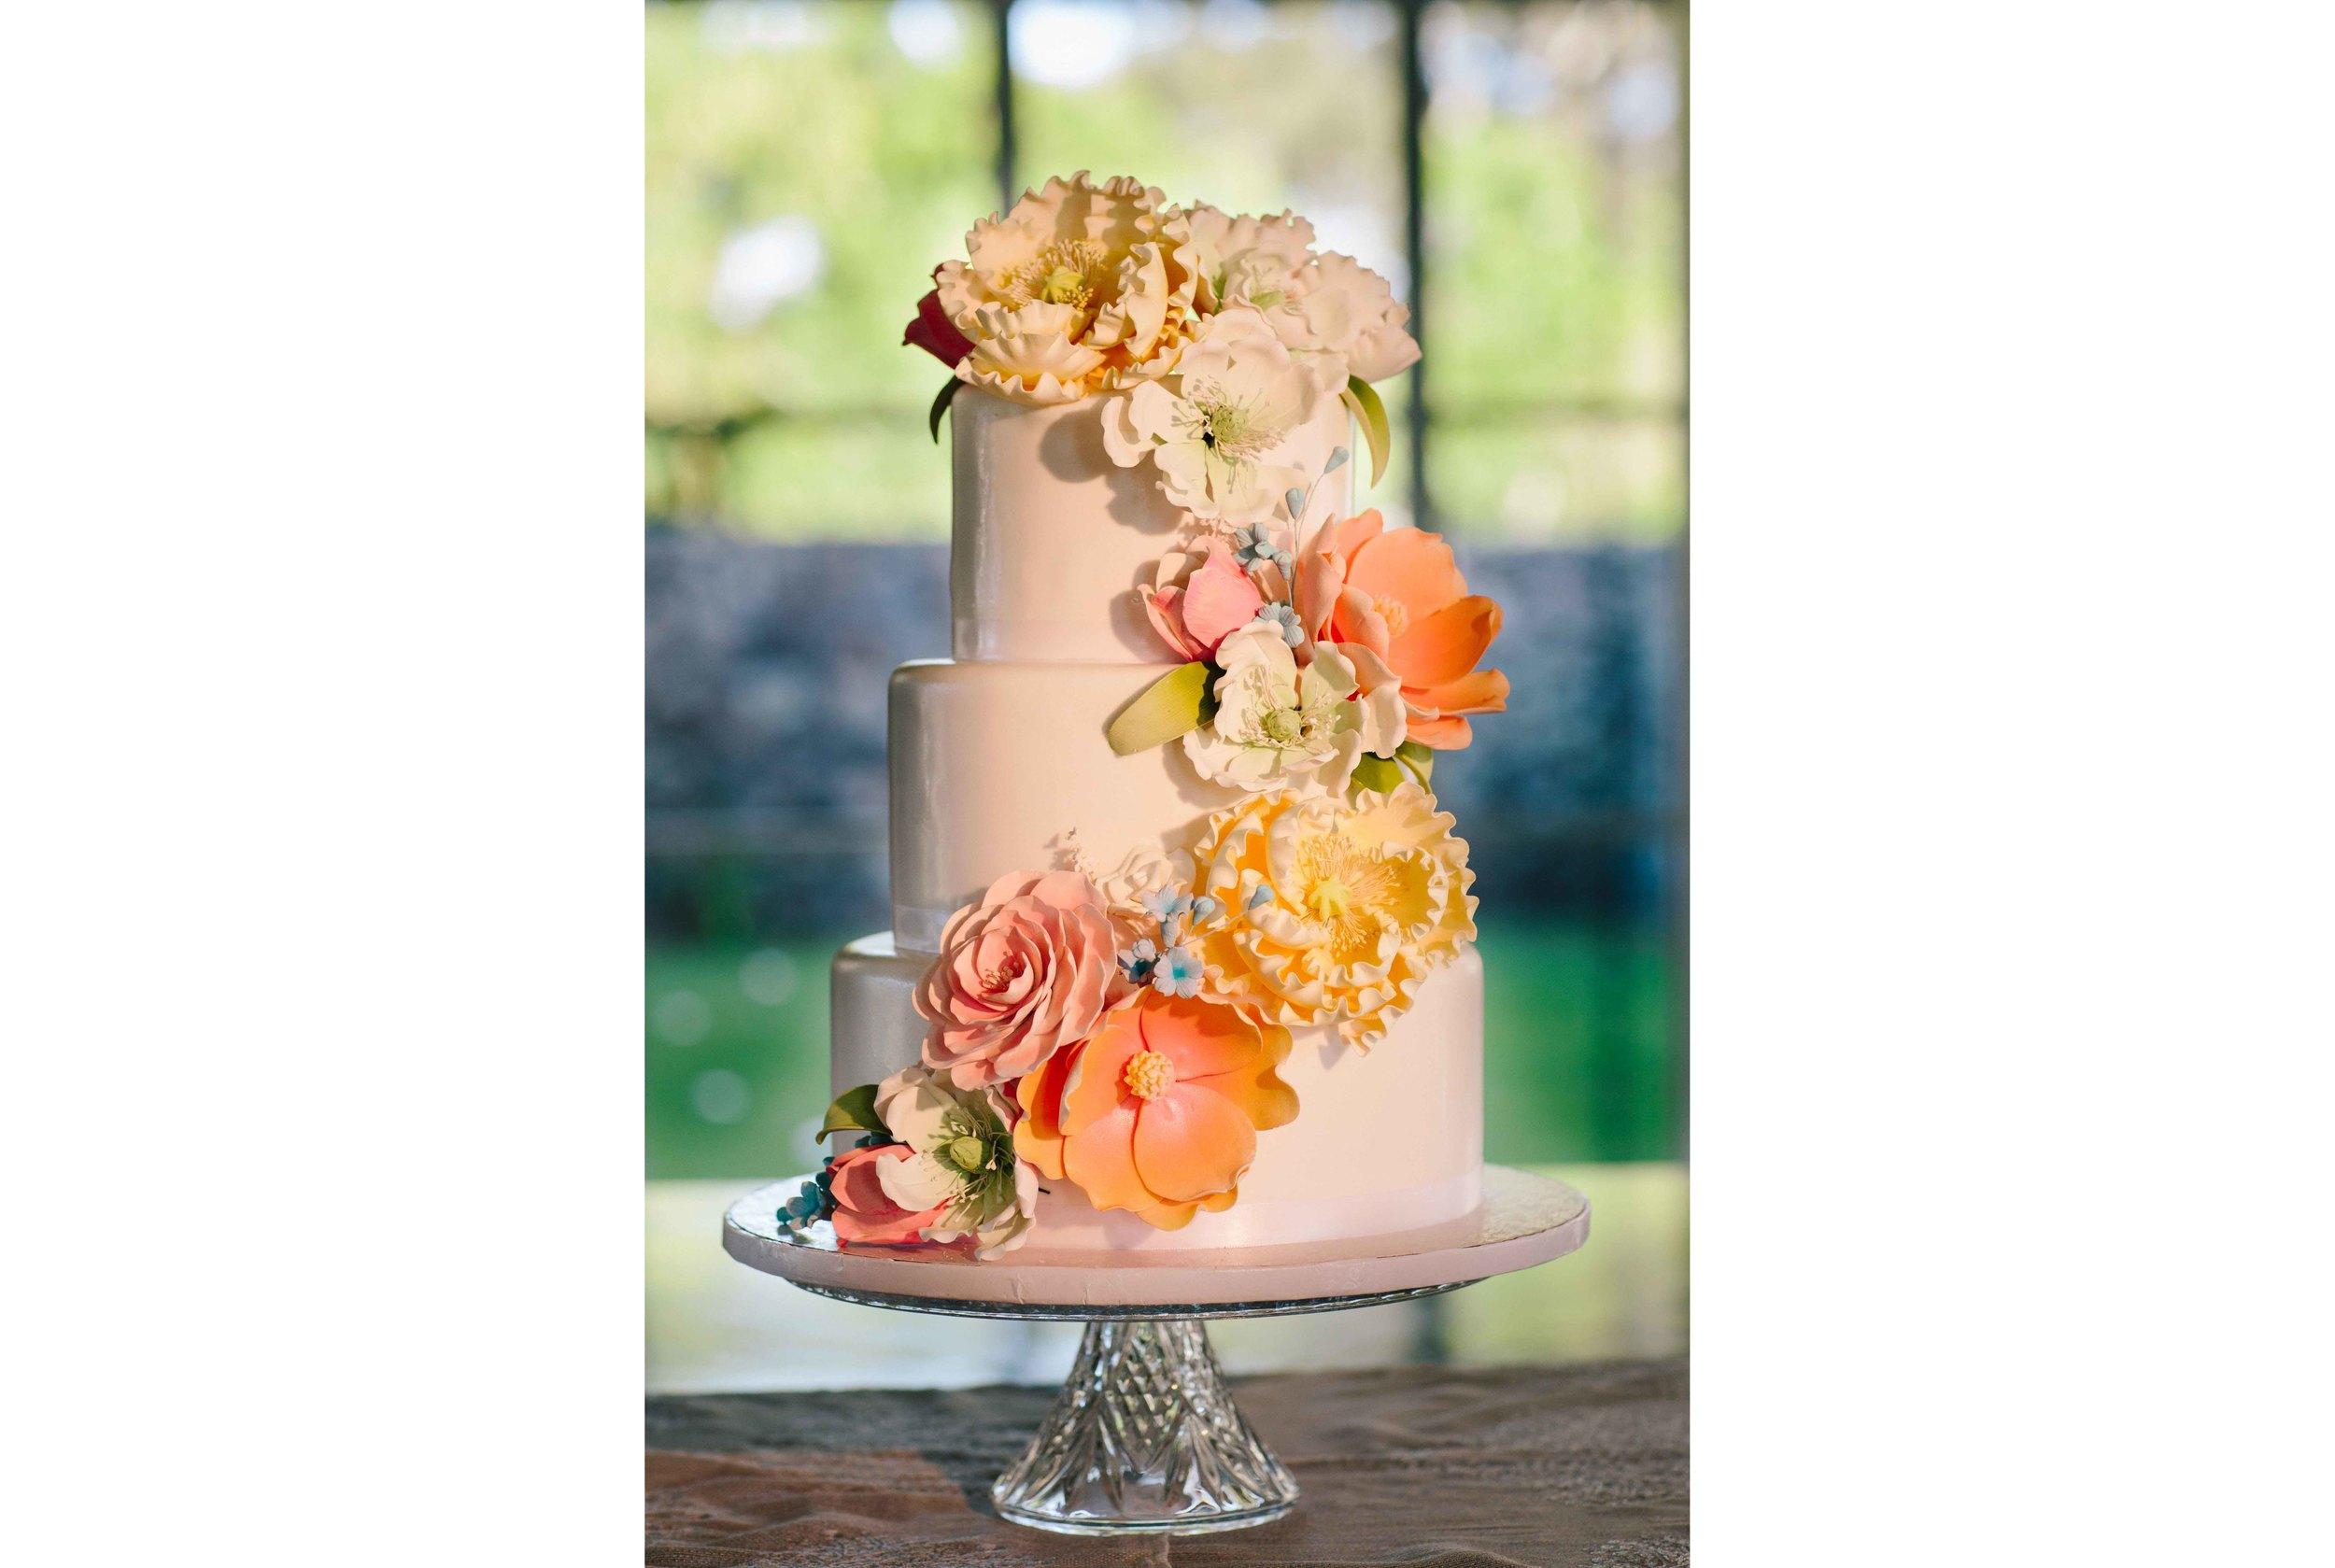 Dillingham Ranch Wedding Cake